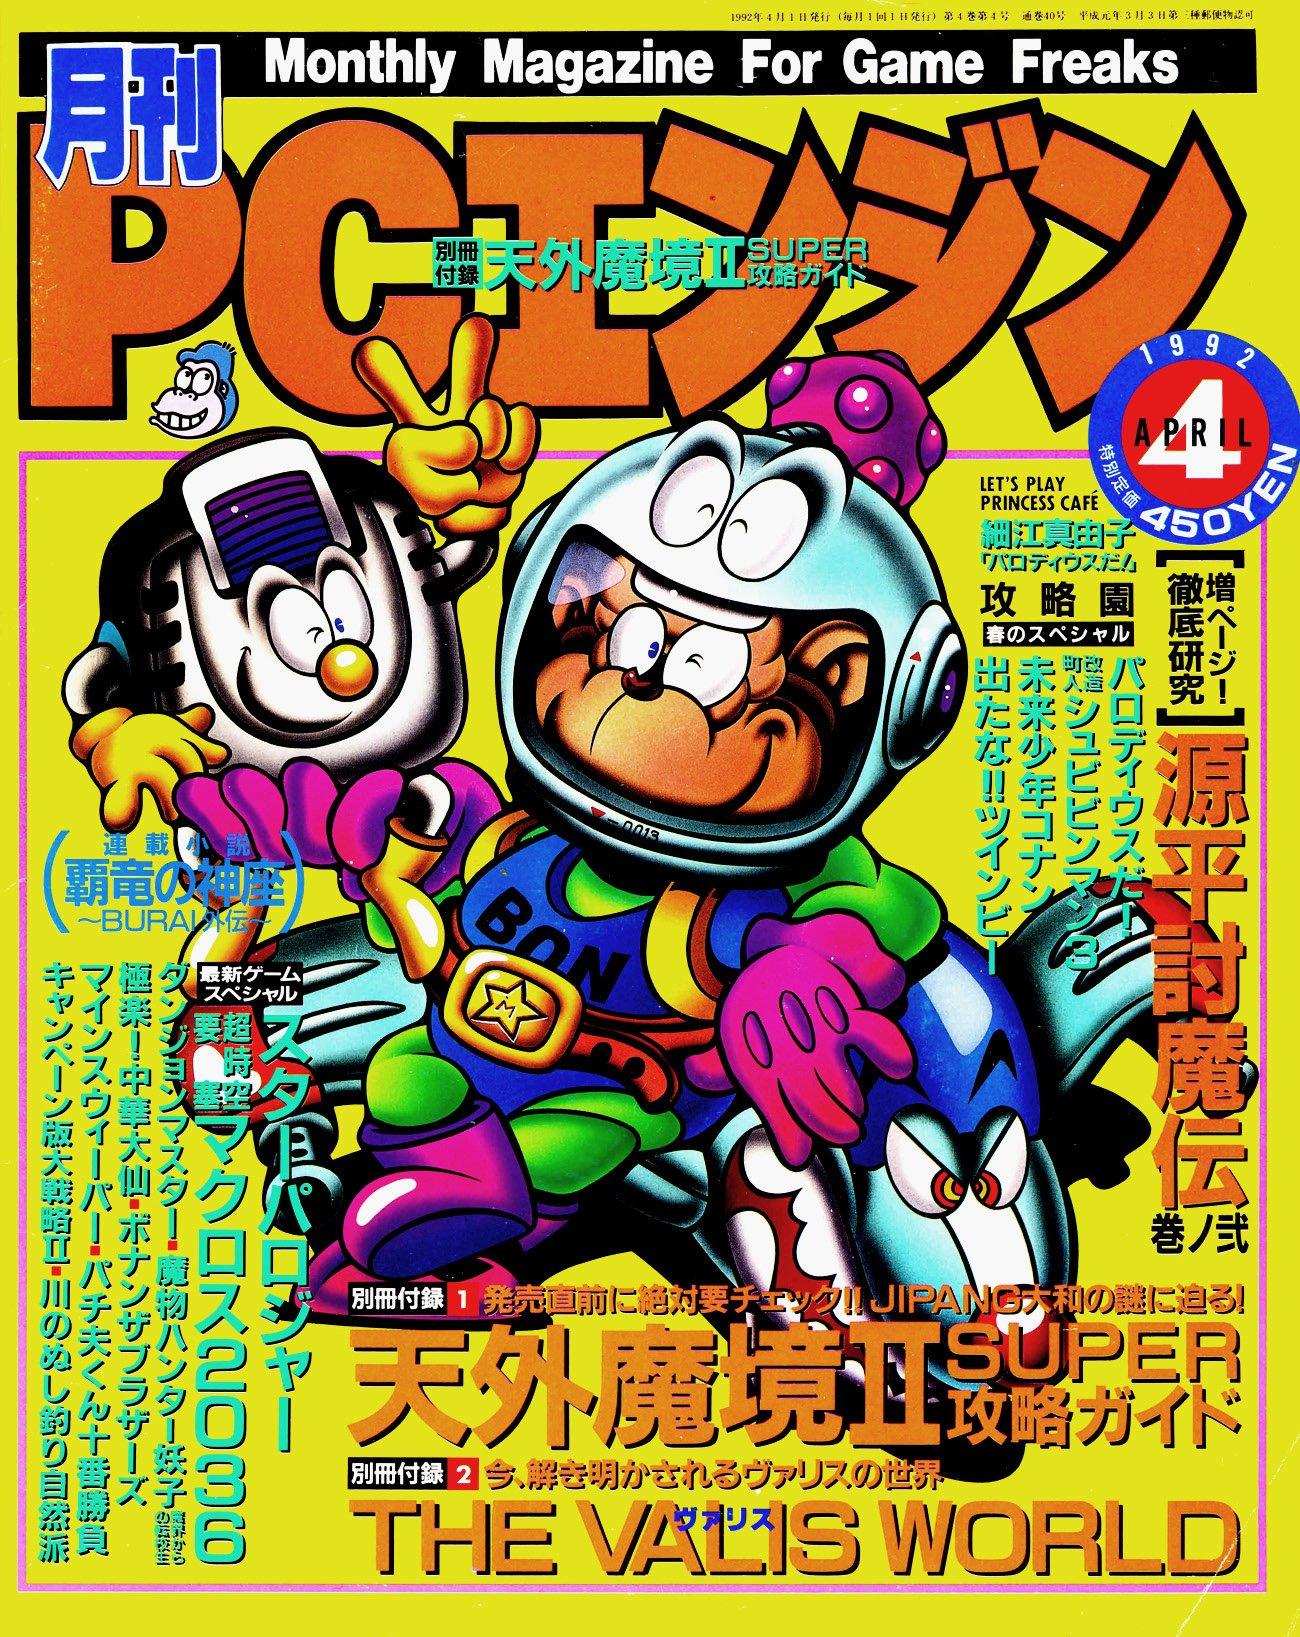 Gekkan PC Engine Issue 40 (April 1992)